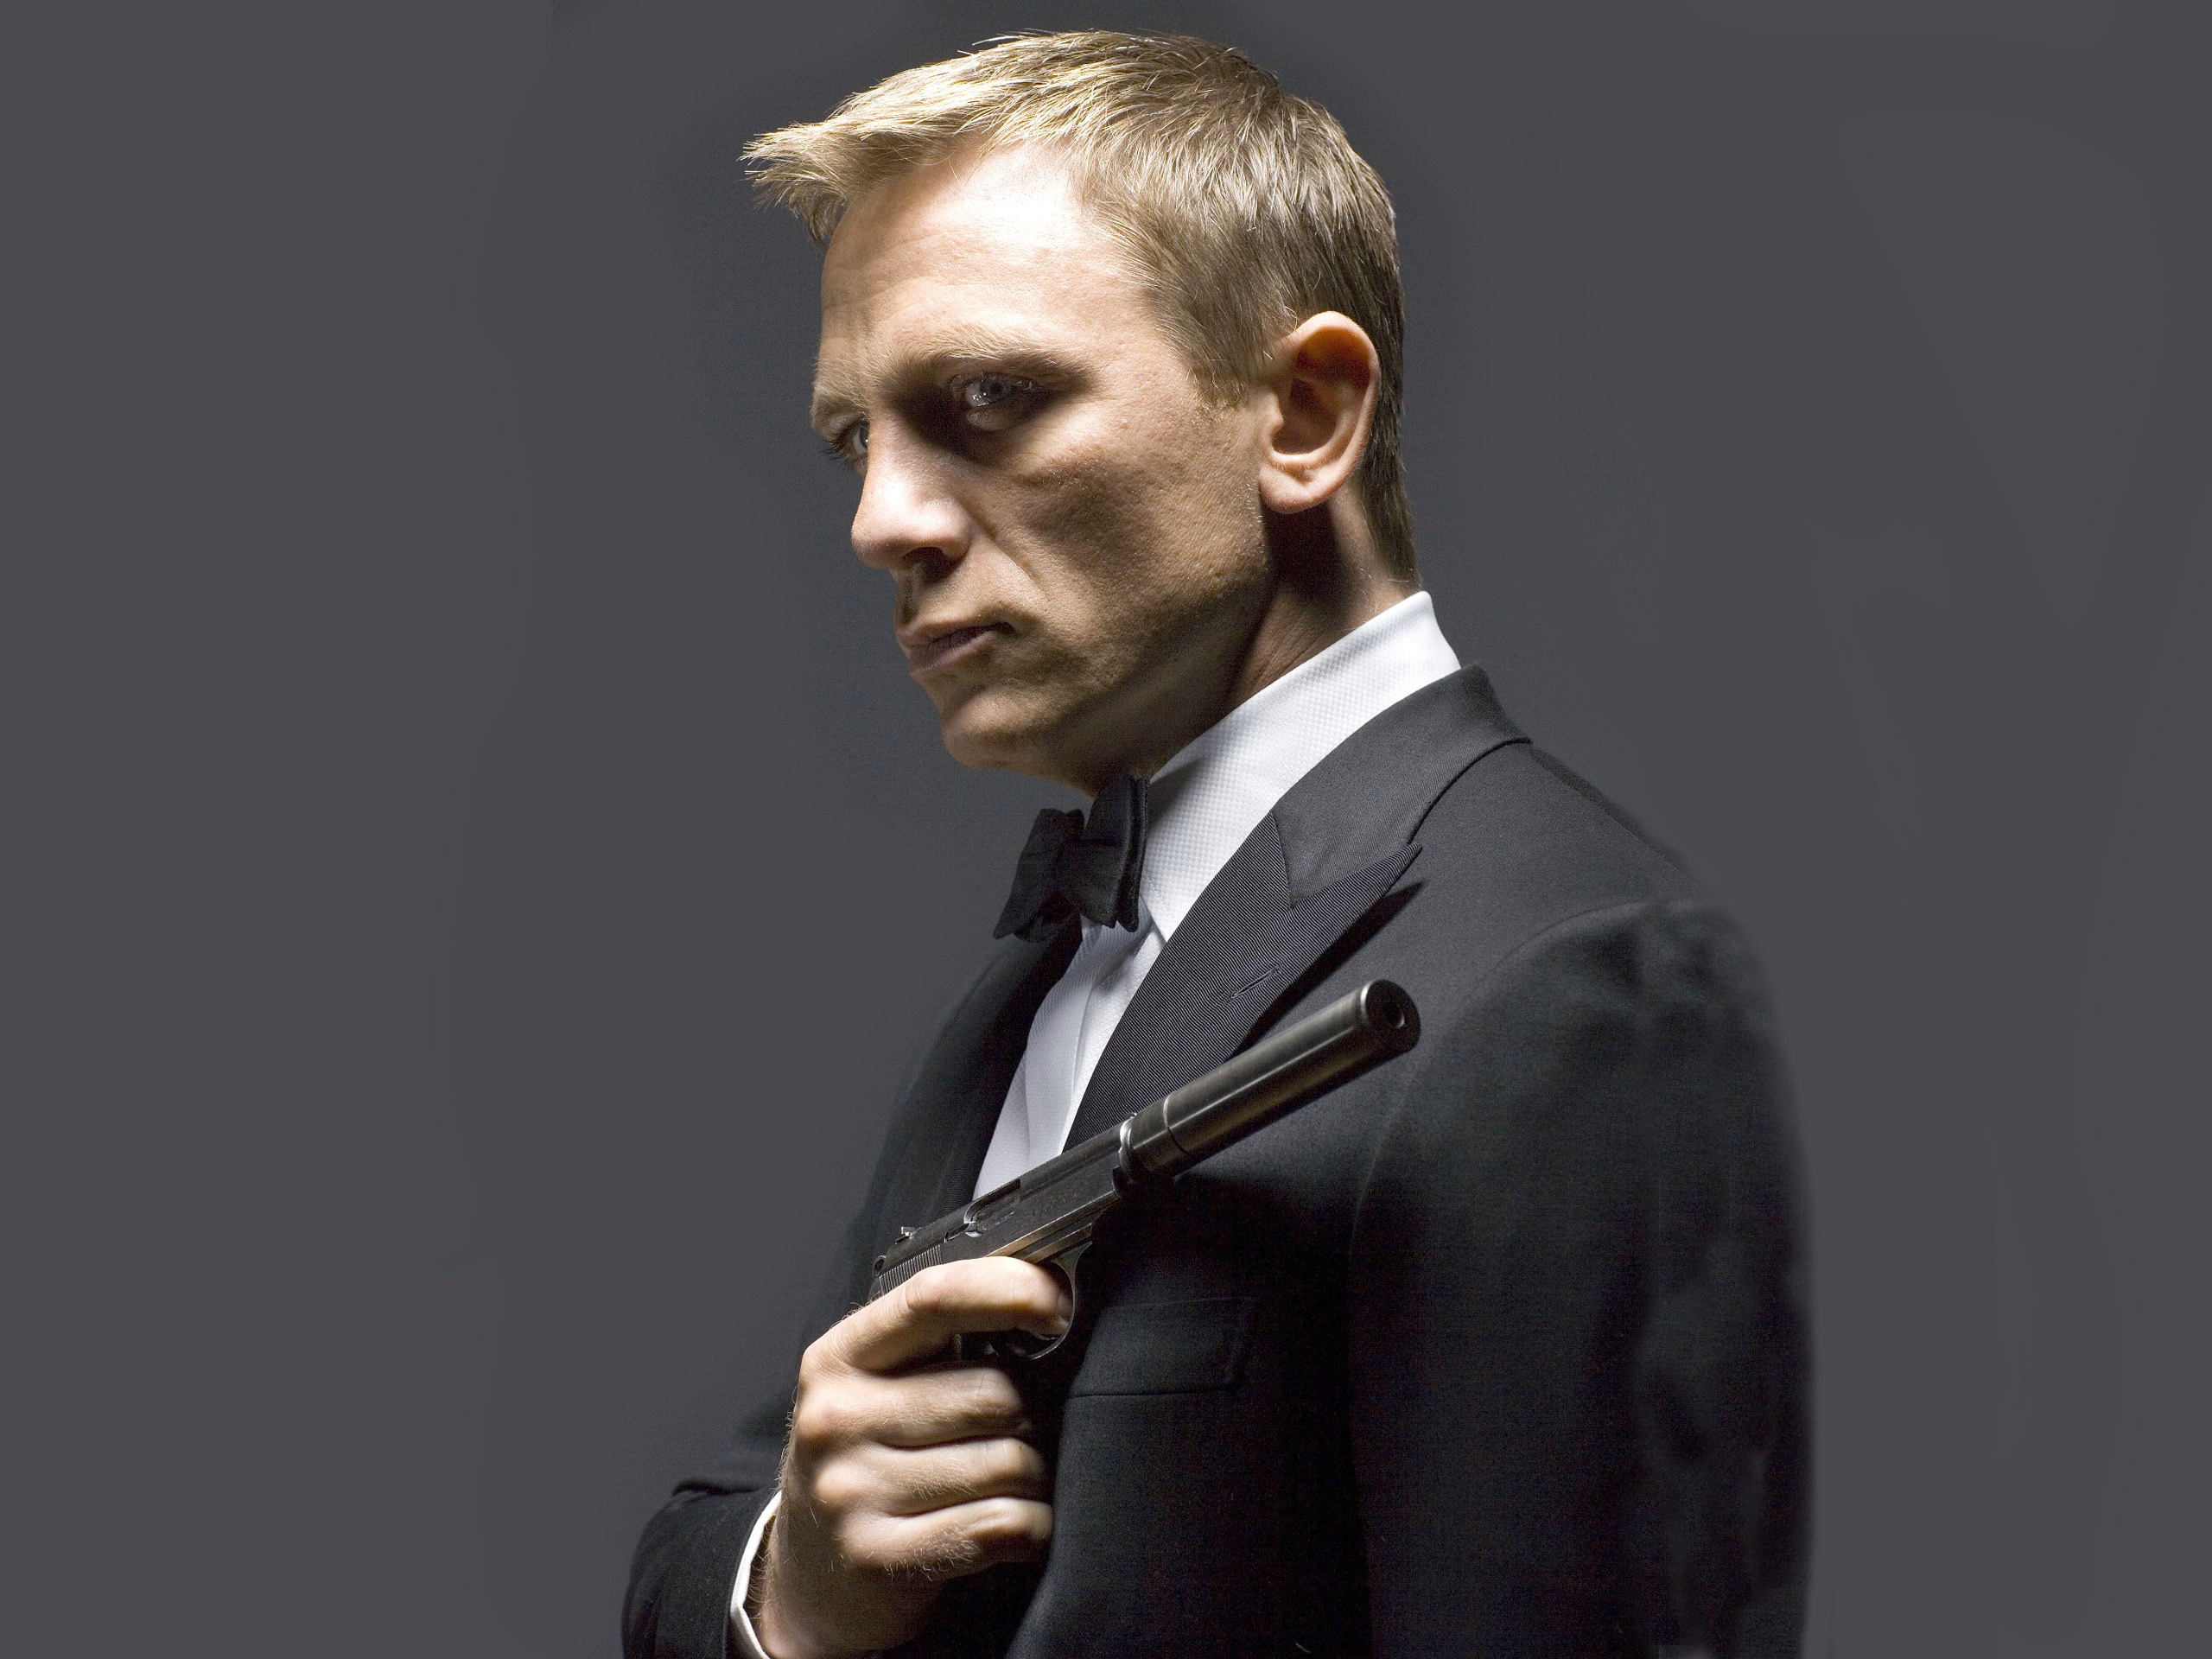 304702_daniel-craig_-dyeniel-krejg_-007_-pistolet_-akter_2560x1920_www.GdeFon.ru_